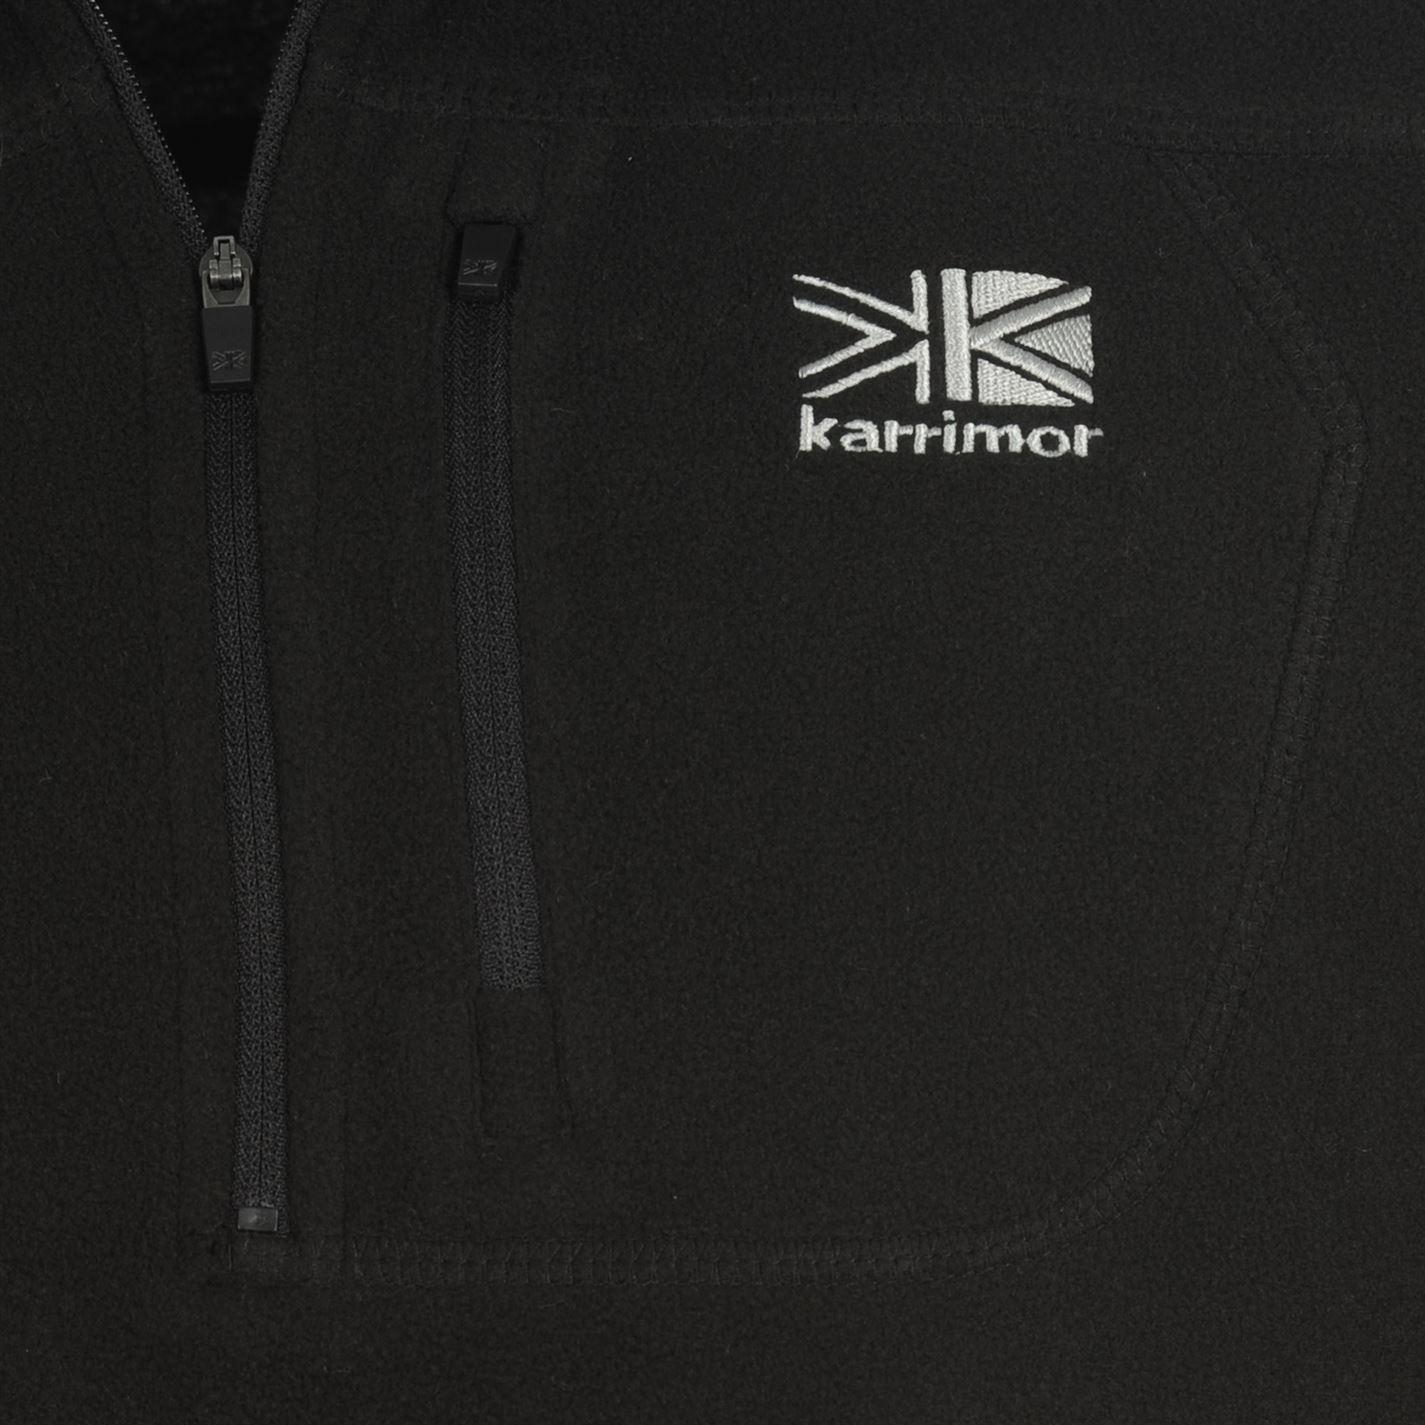 Pánska fleecová mikina Karrimor KS200 Micro